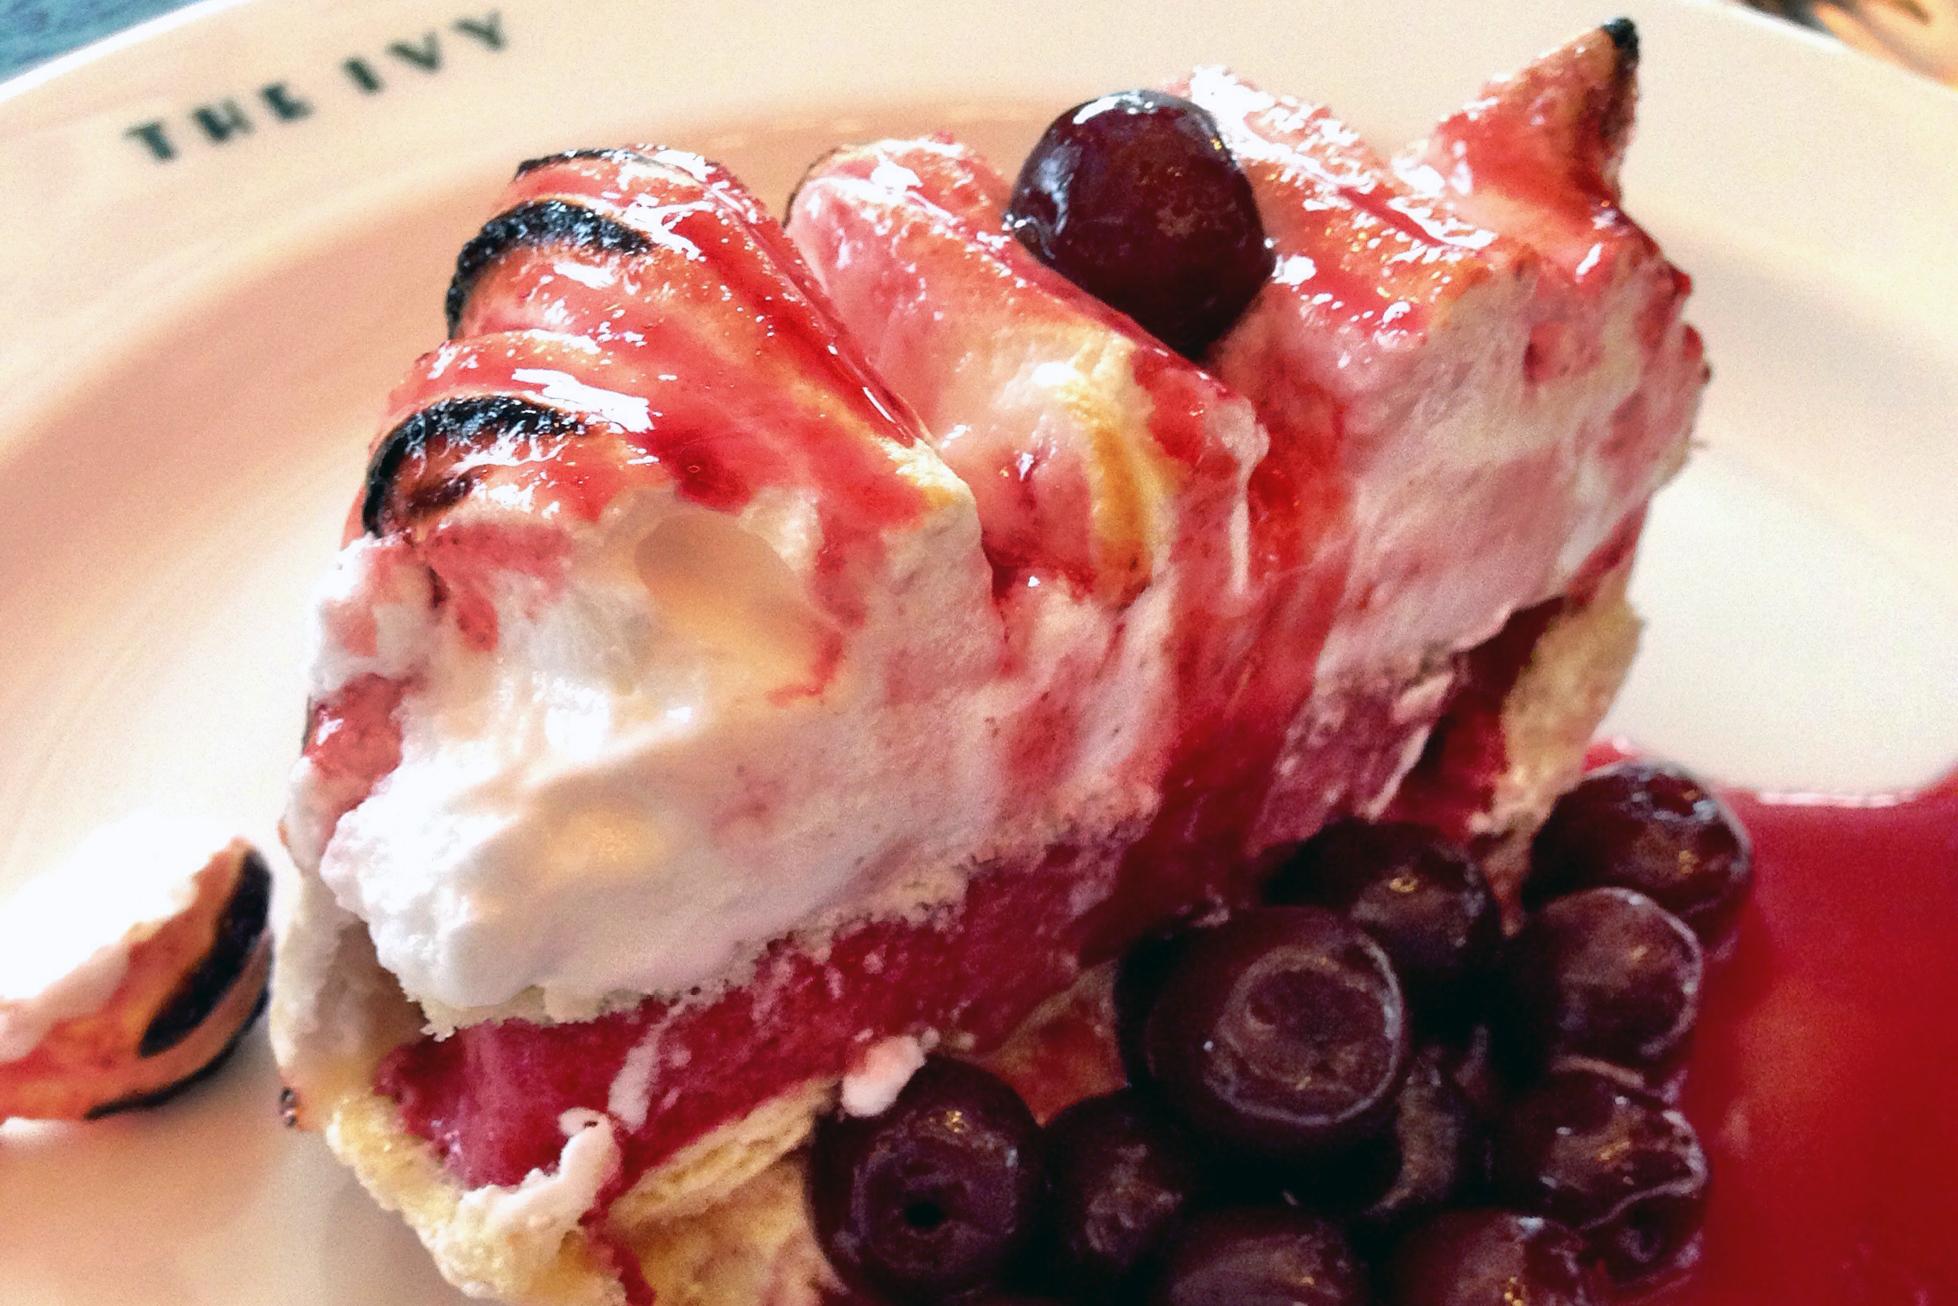 Ivy dessert